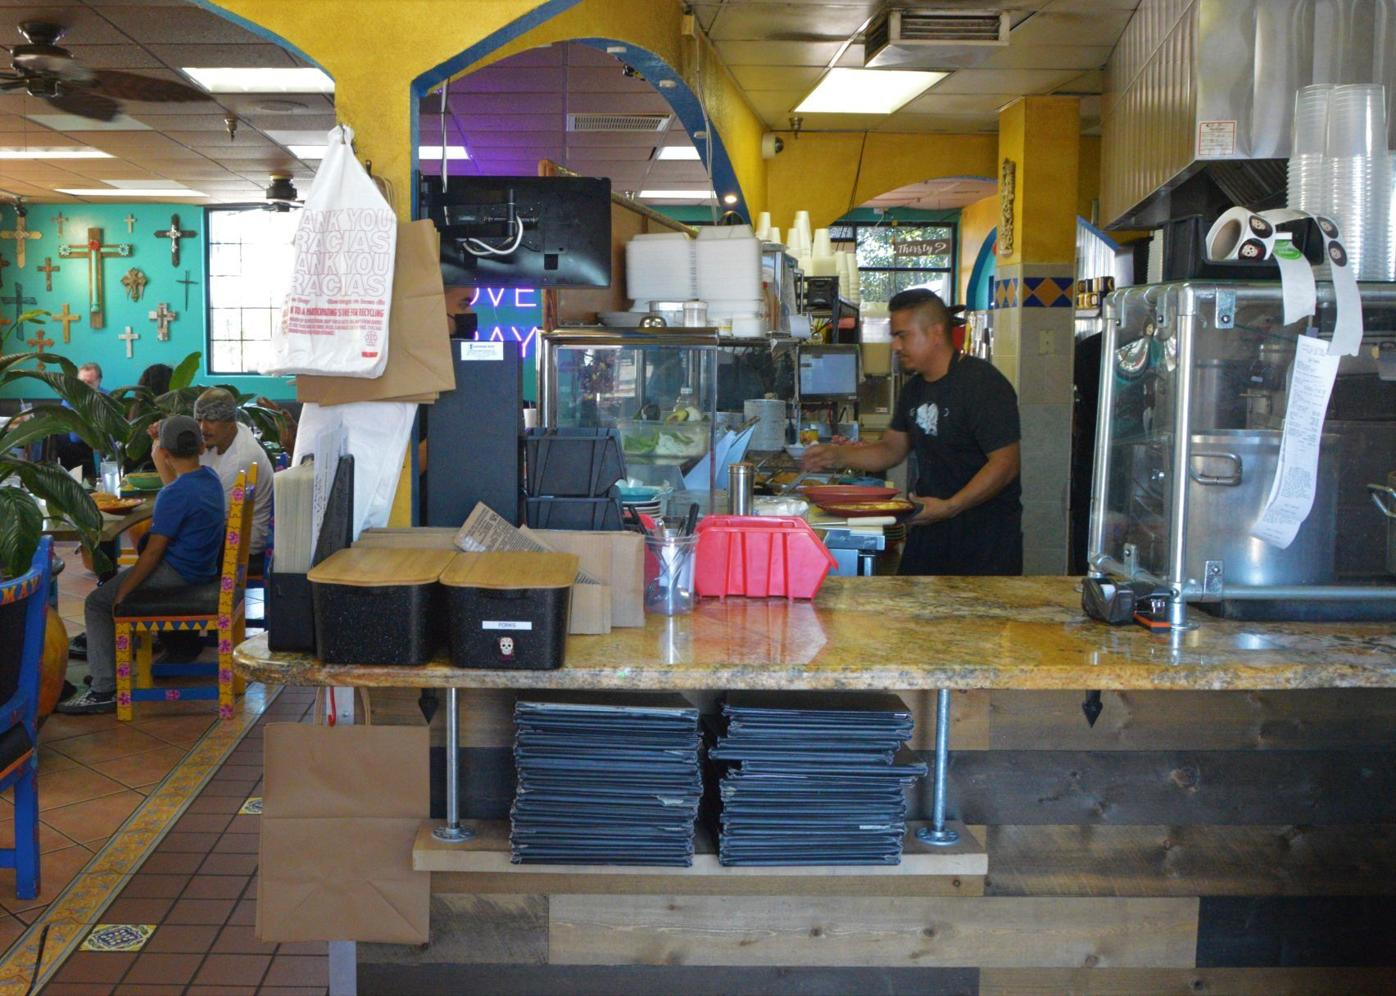 072921 maya restaurantJPG.jpg